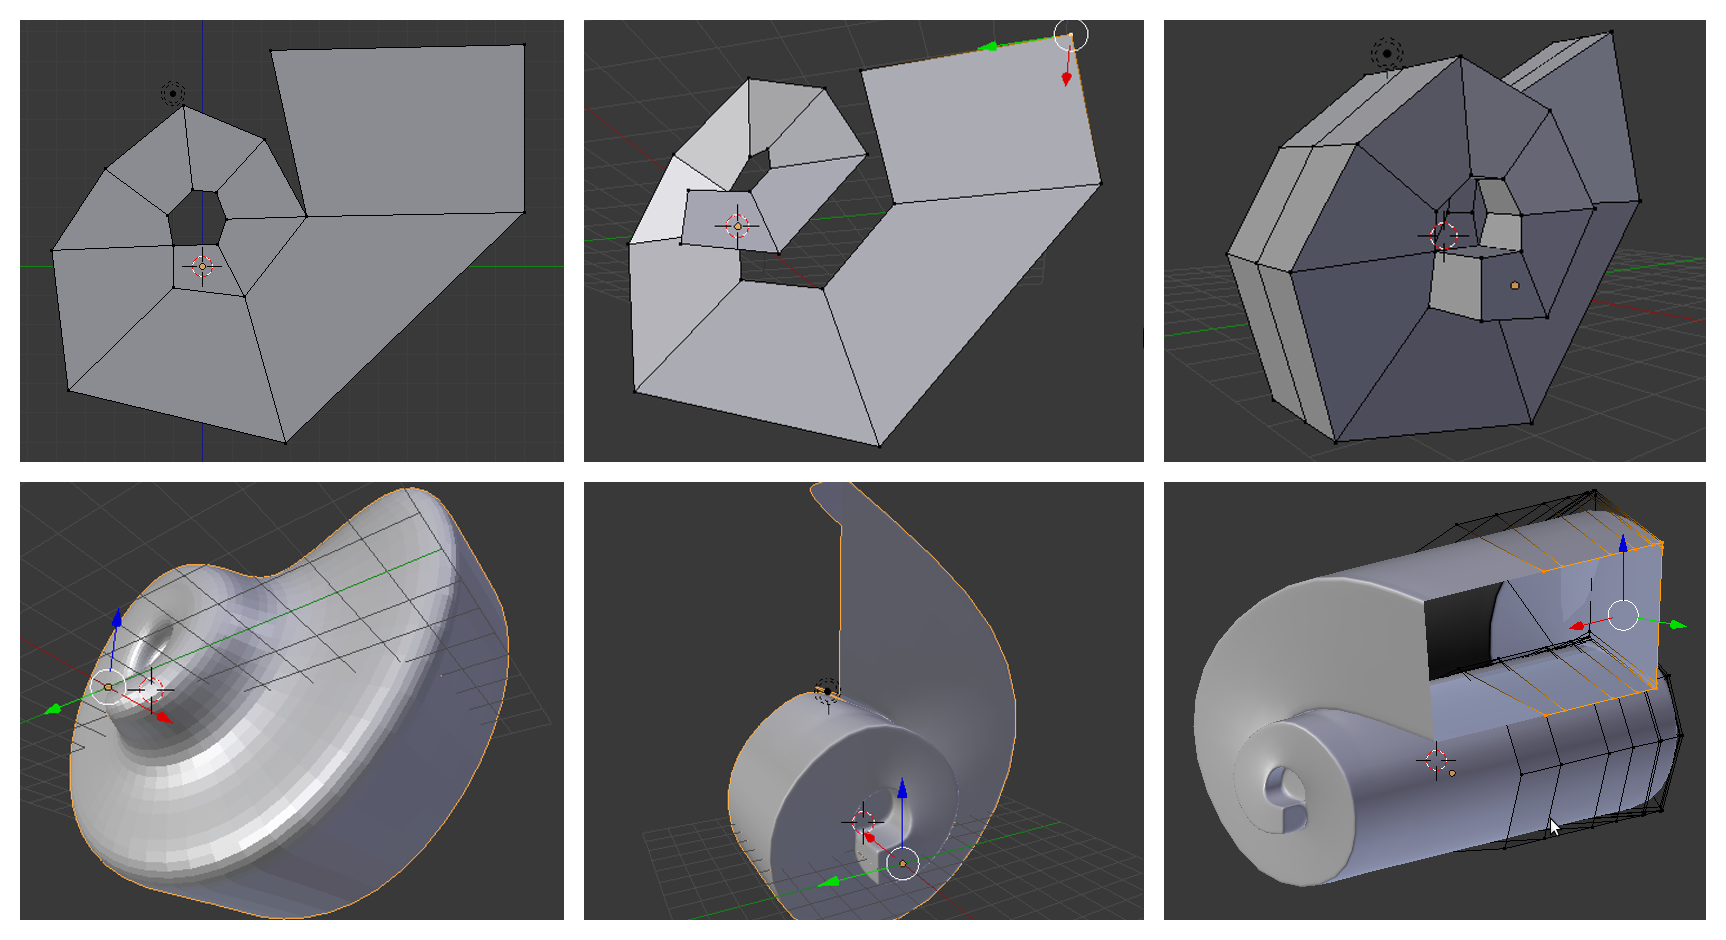 Blender formas ornamentales y curvas for Formas ornamentales